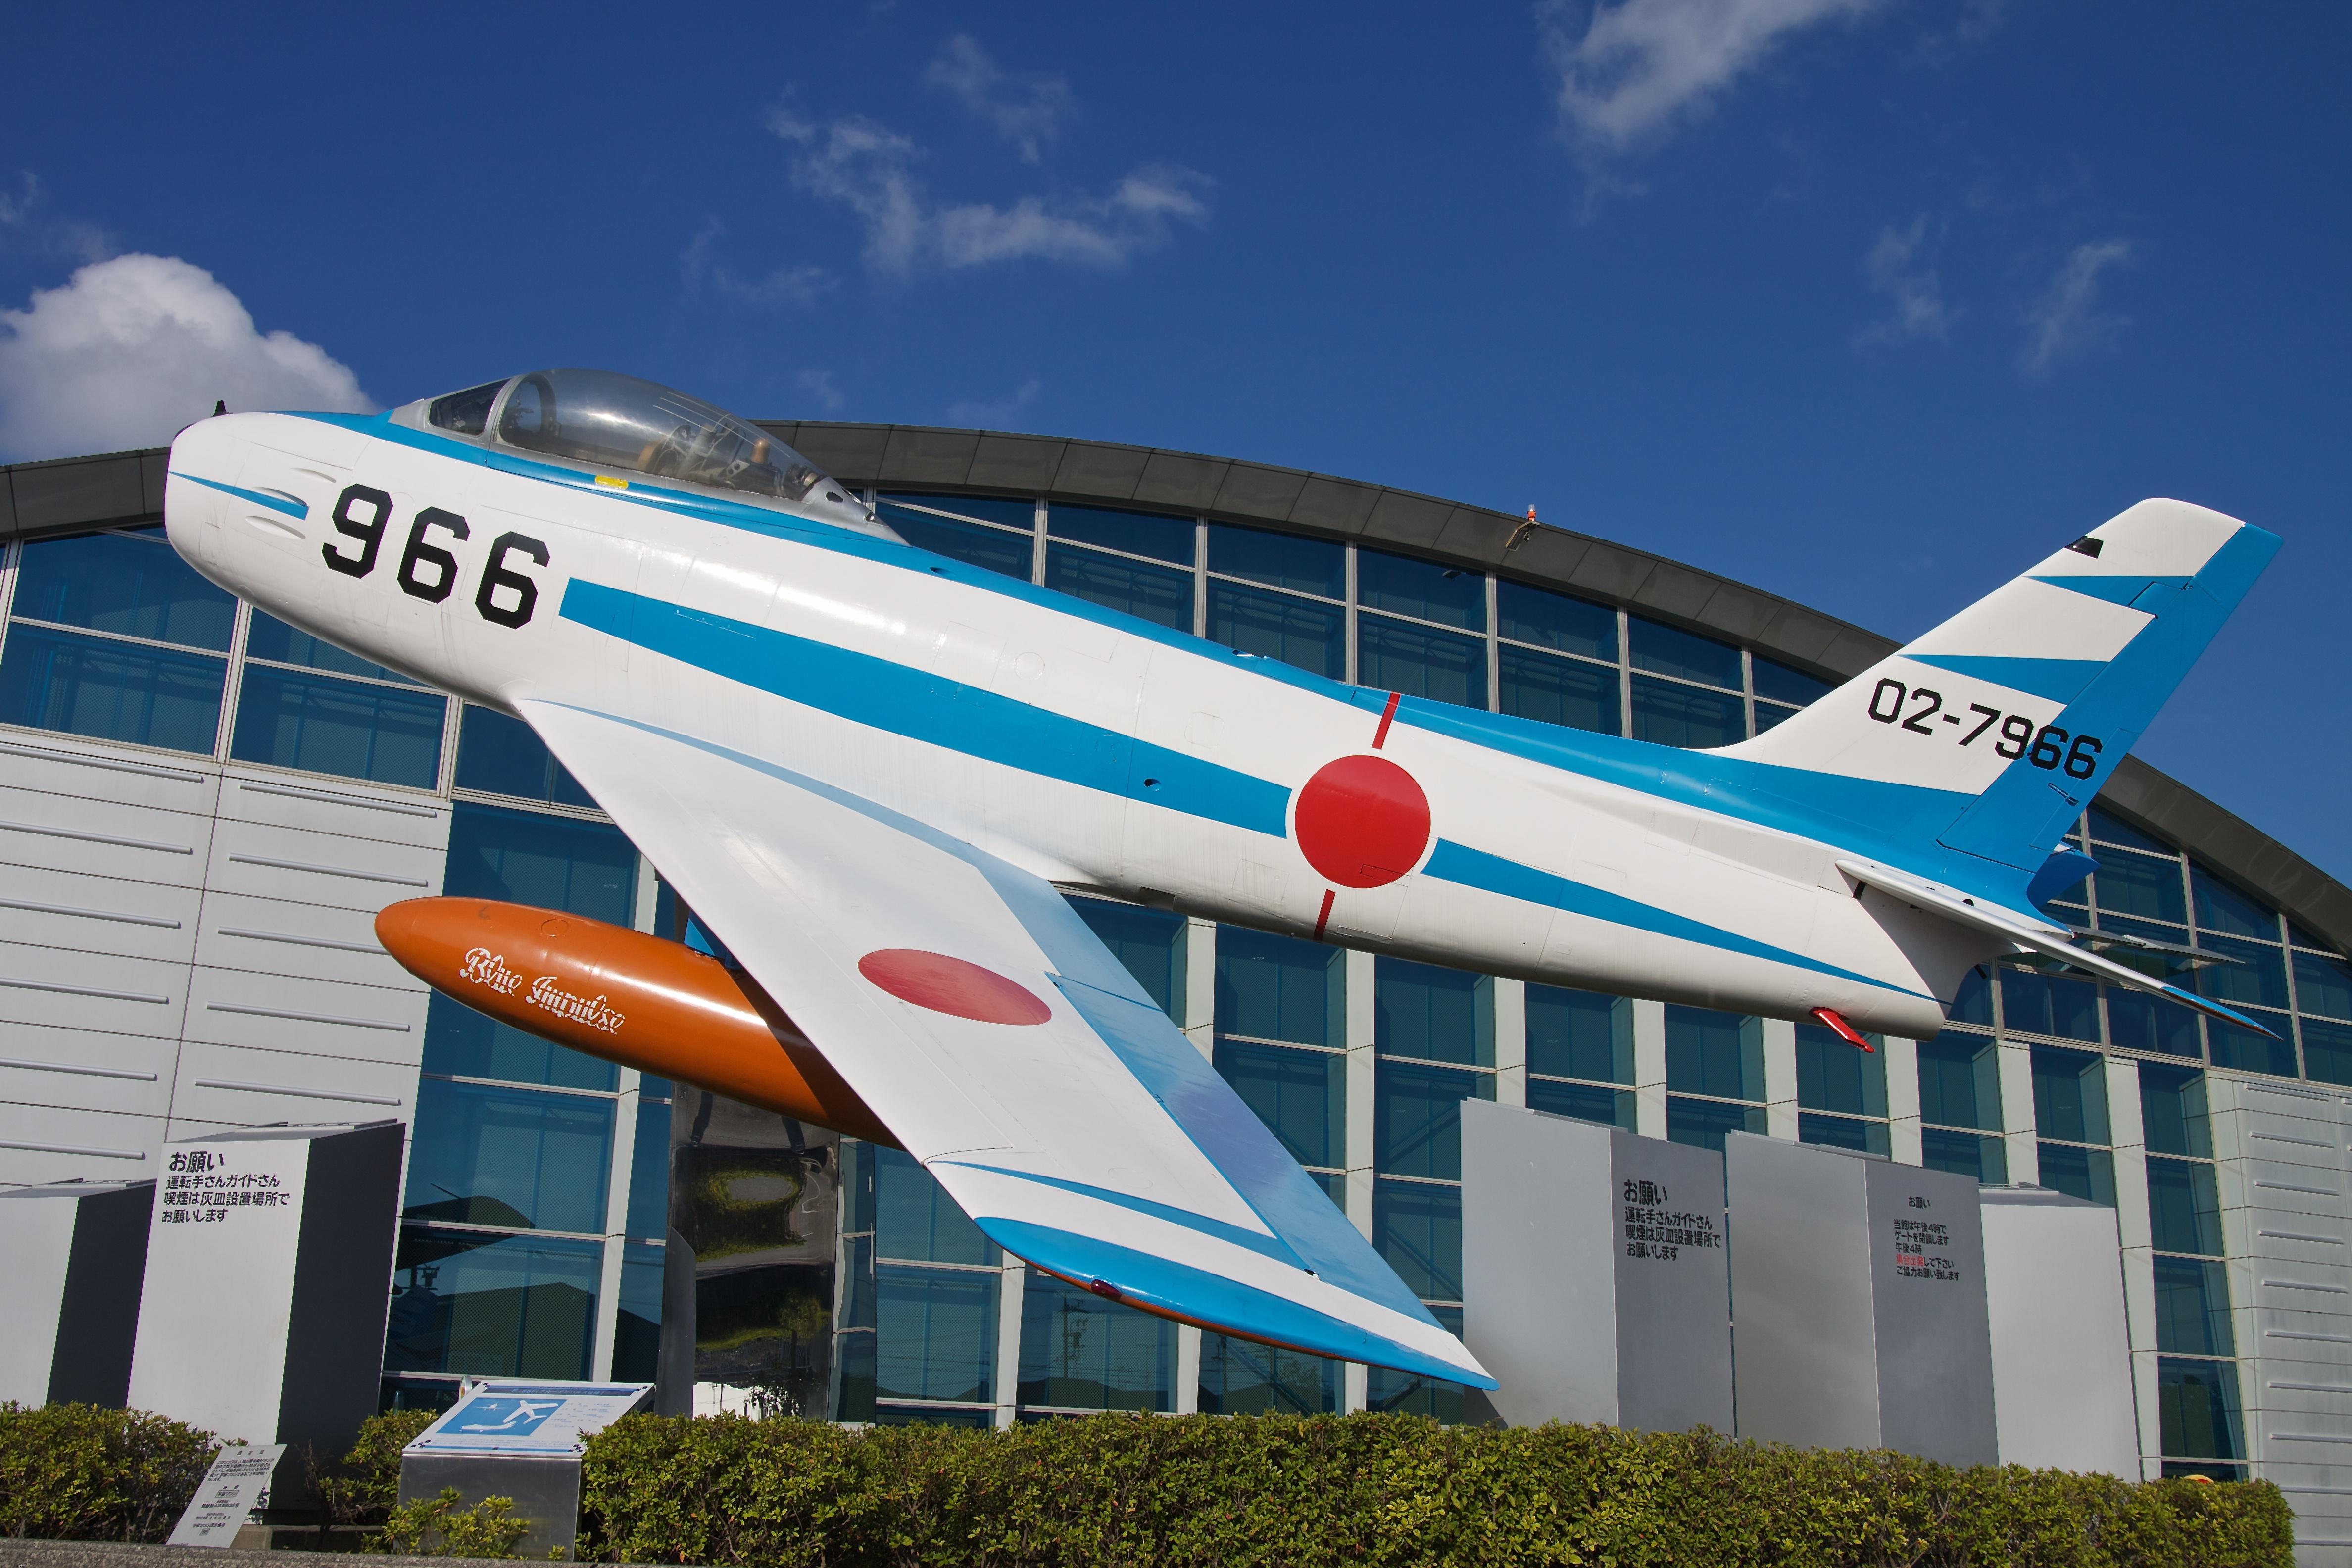 F-86 Sabre with Japan Air Self-Defense Force Blue Impulse aerobatic team paint job on display